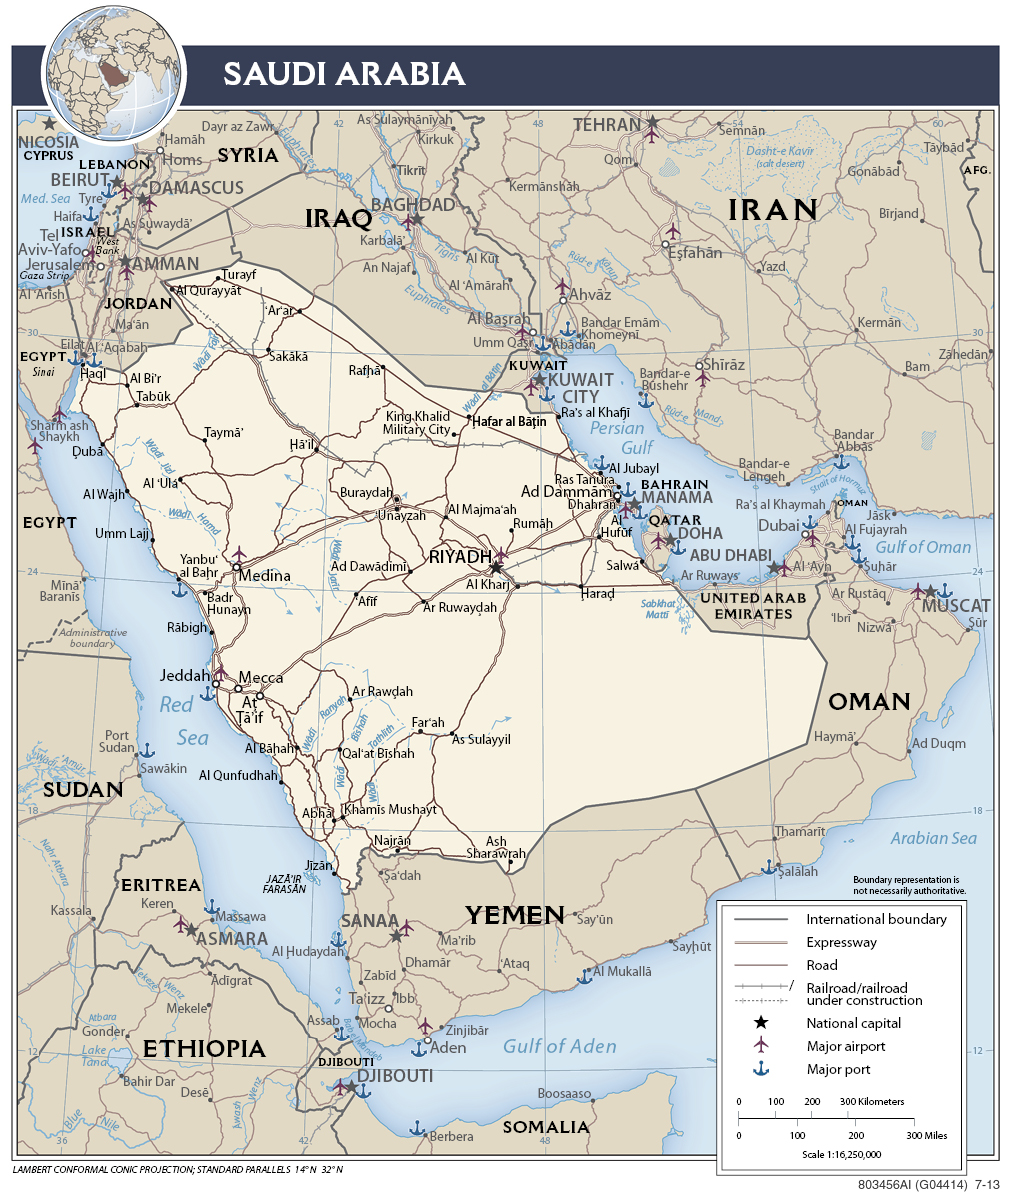 saudi_arabia_trans-2013.jpg